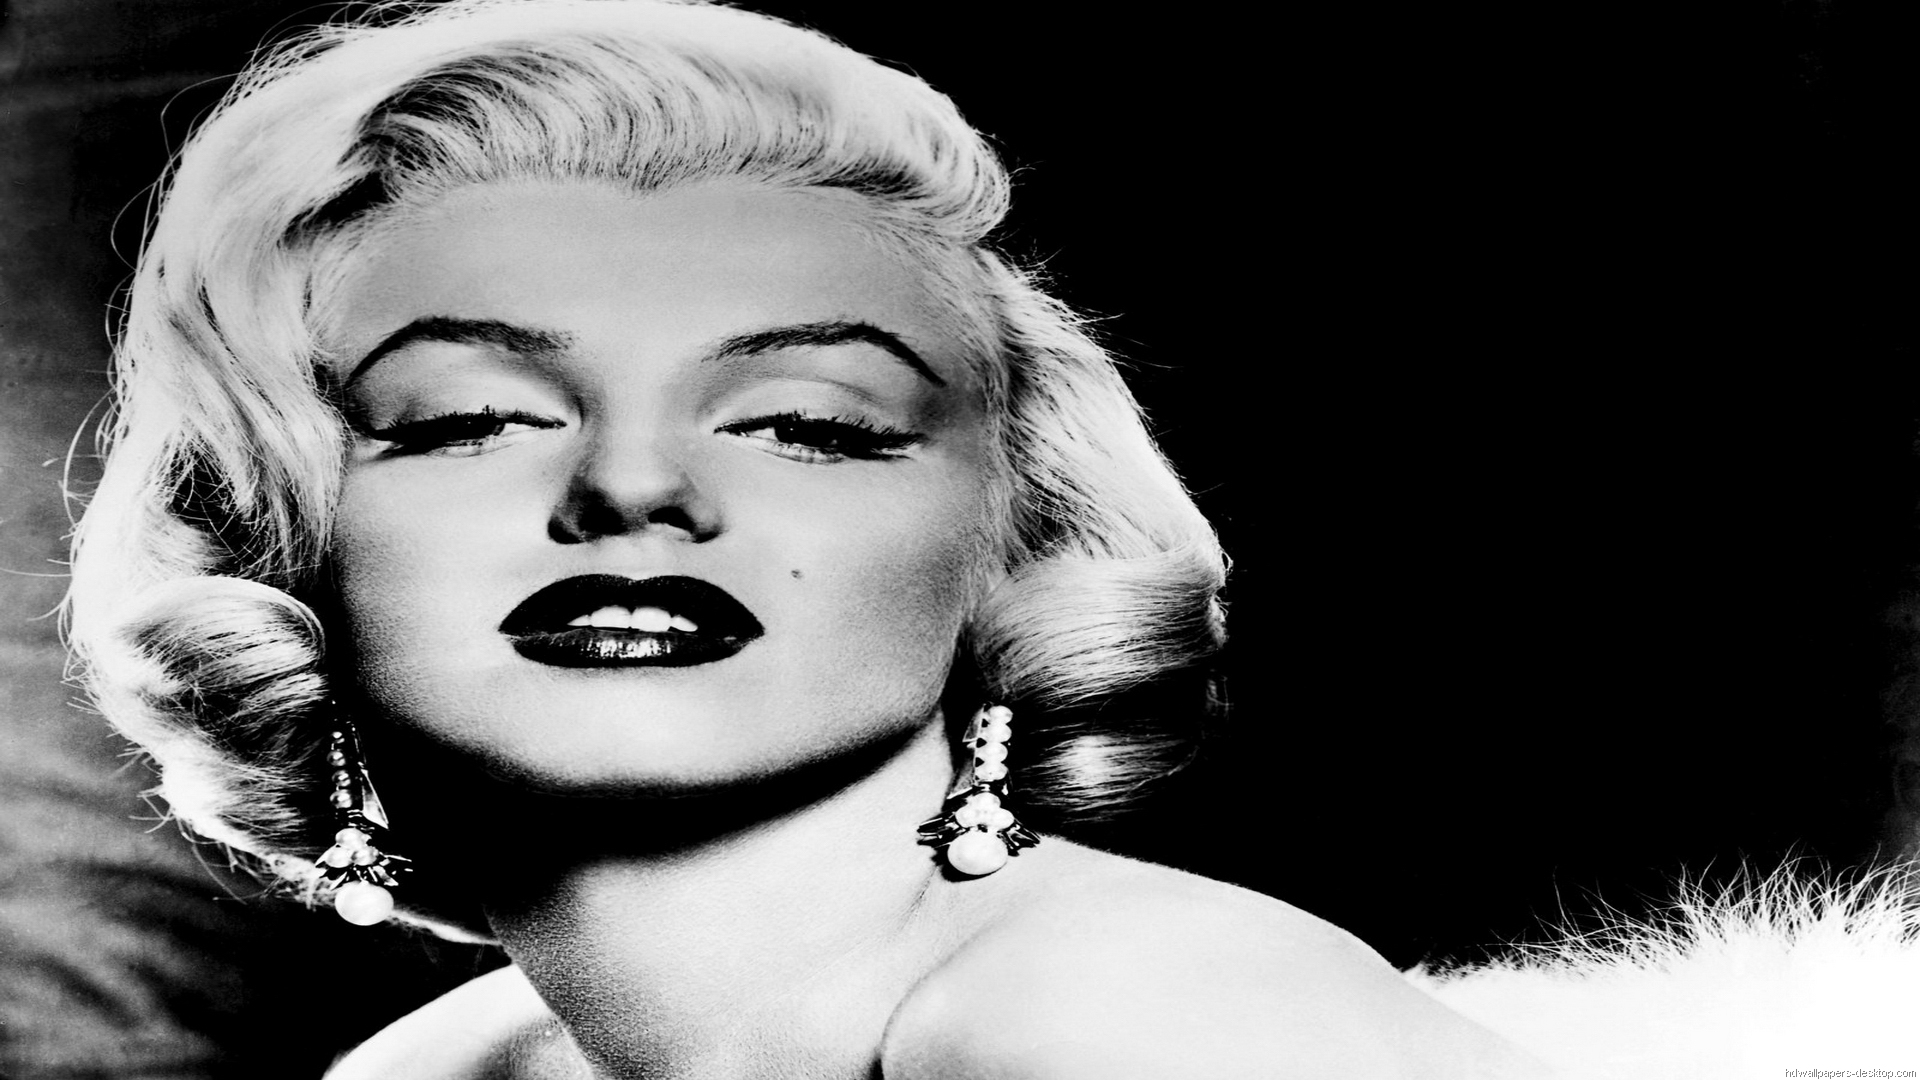 Hd marilyn monroe wallpapers wallpapersafari - Marilyn monroe wallpaper download ...